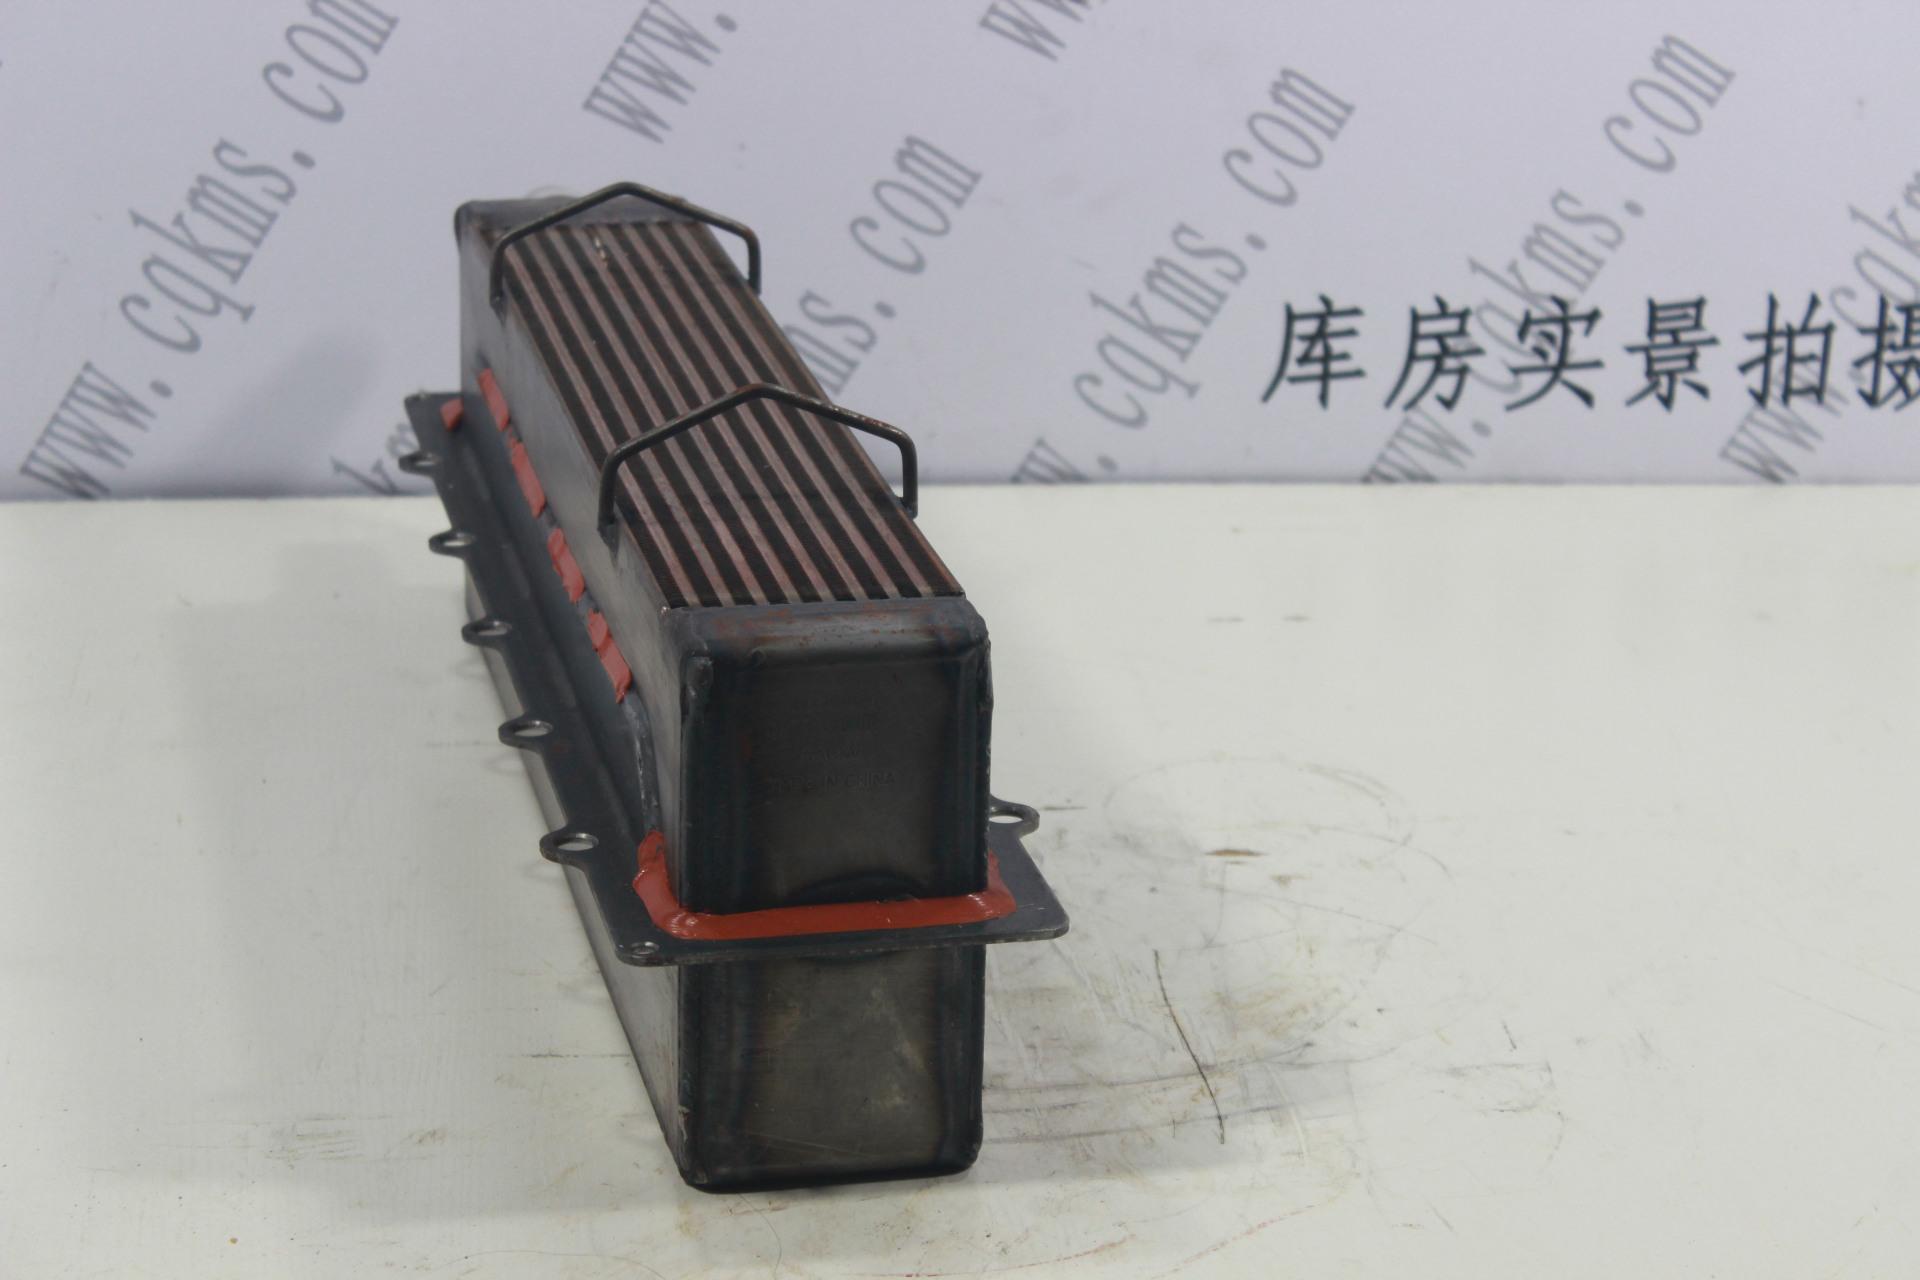 kms00331-4101032-中冷器芯-用于QSK45康明斯发动机-QSK45图片4